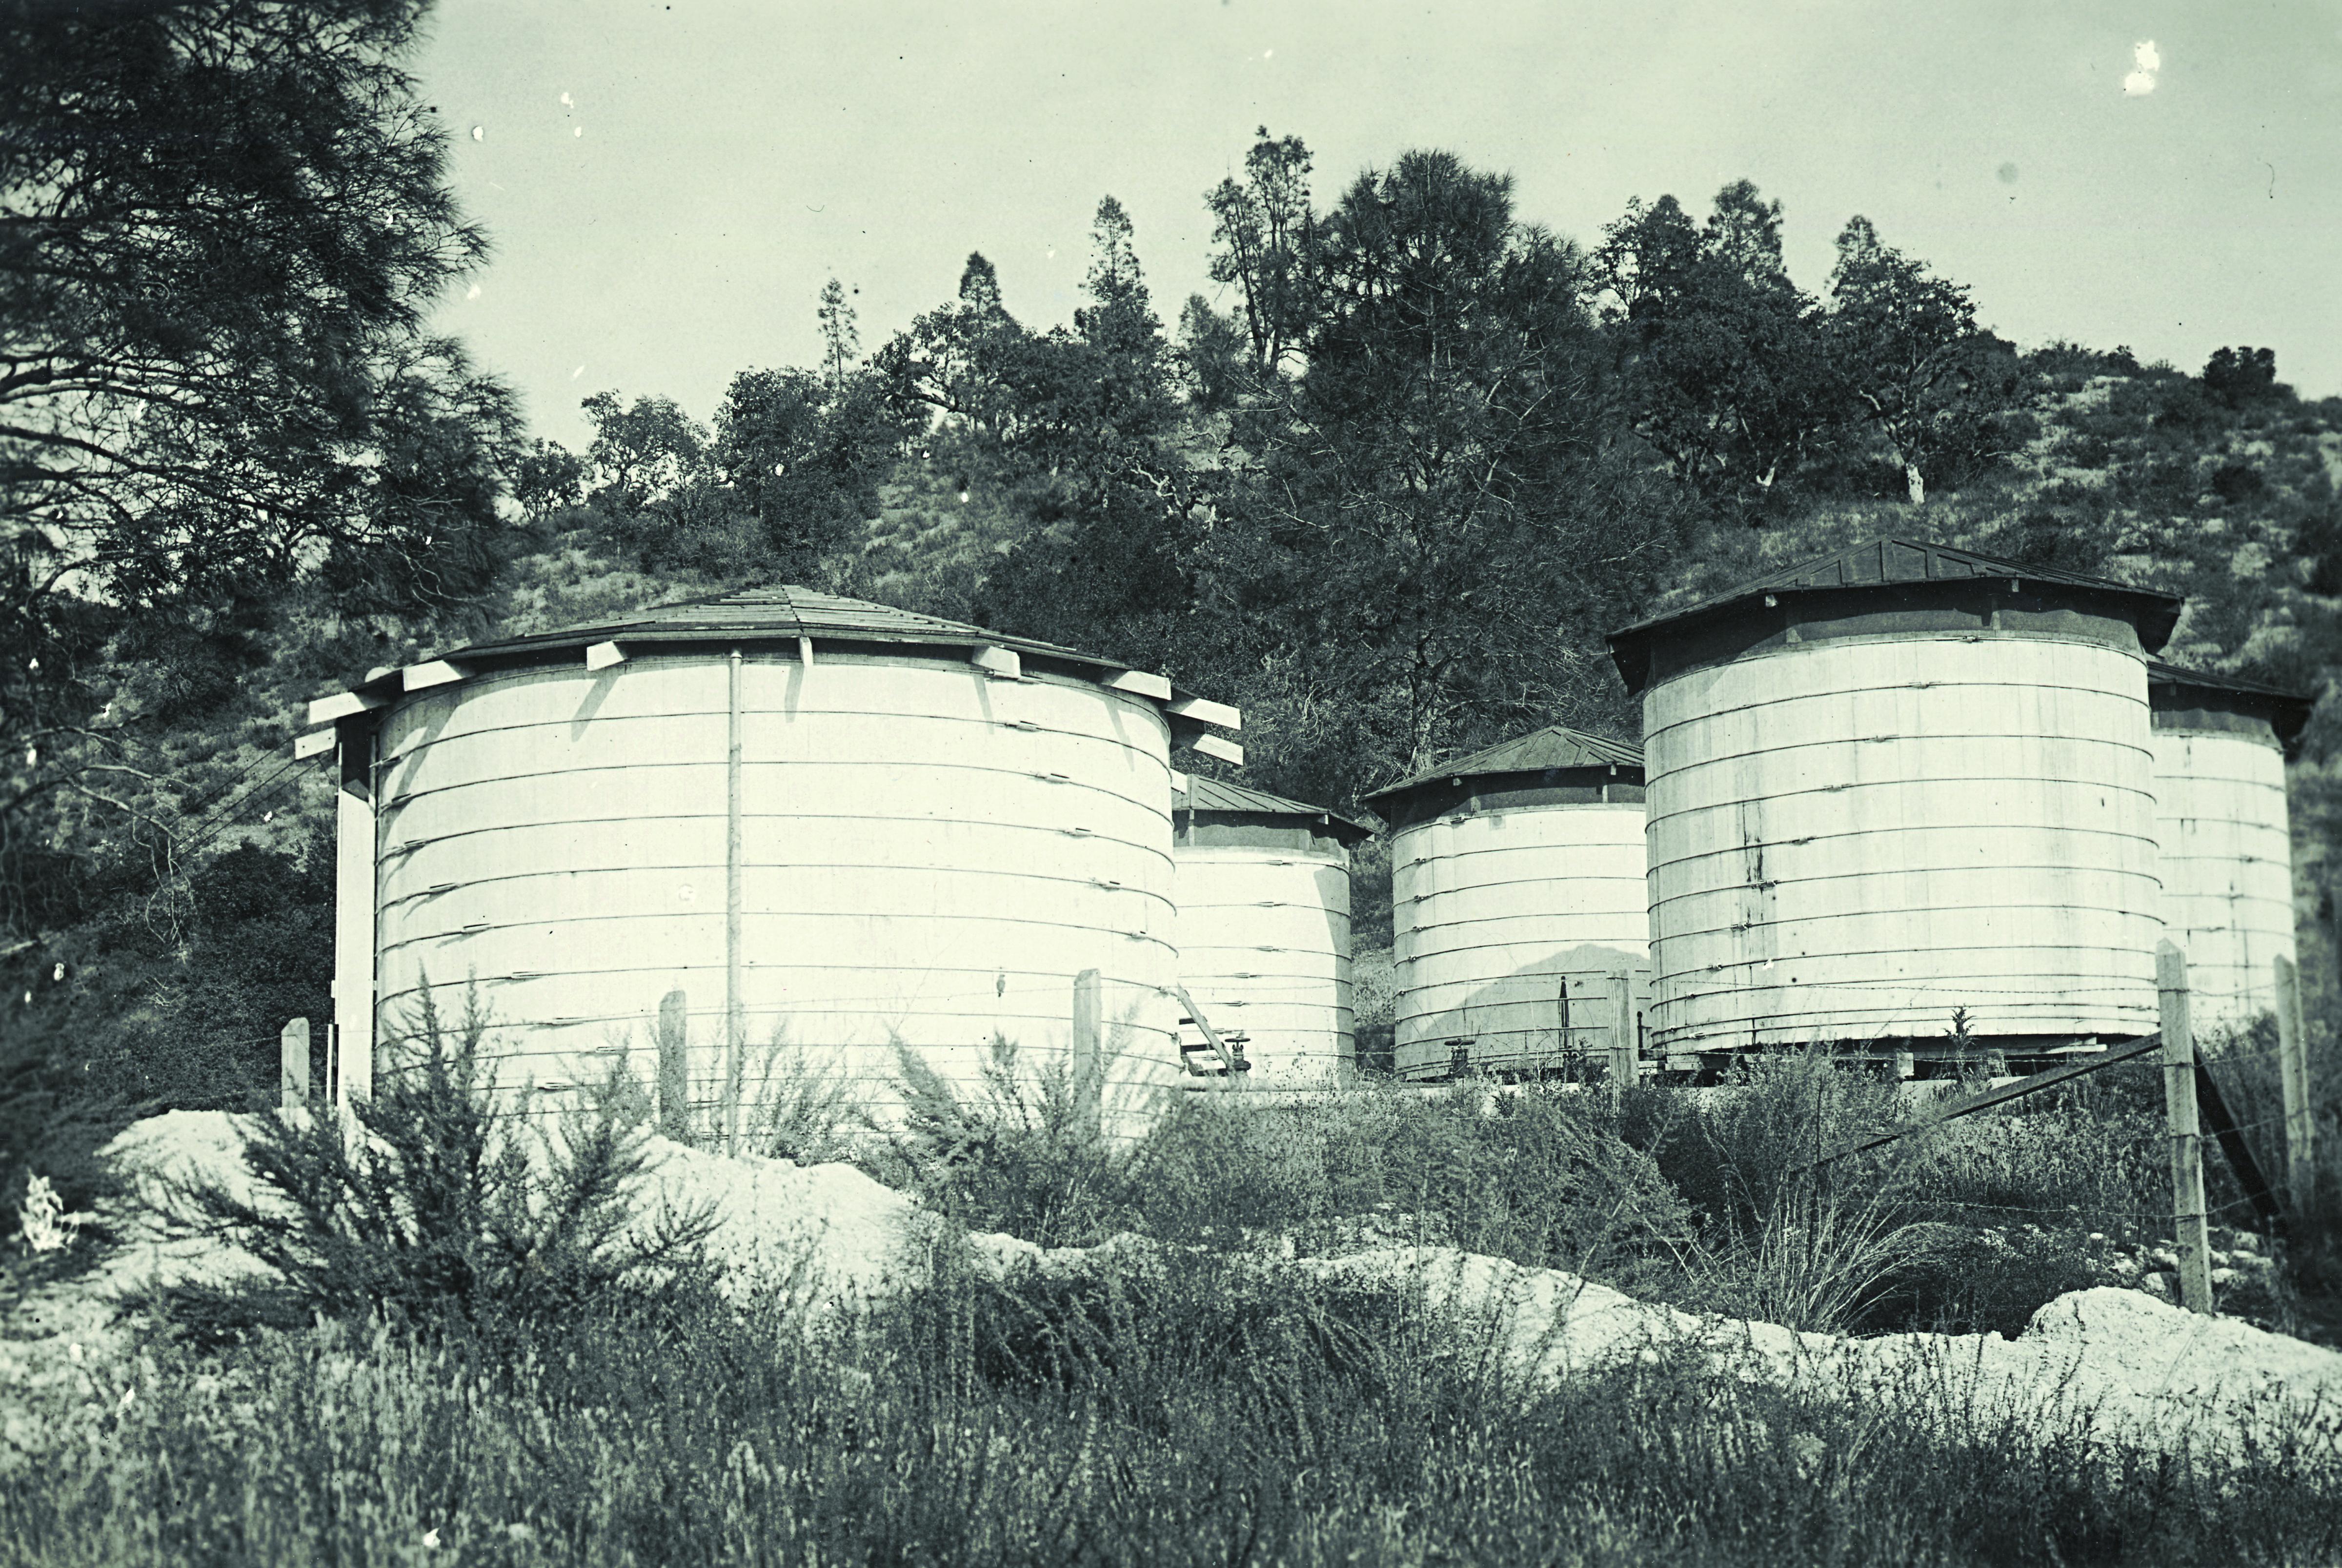 AMWC Tanks